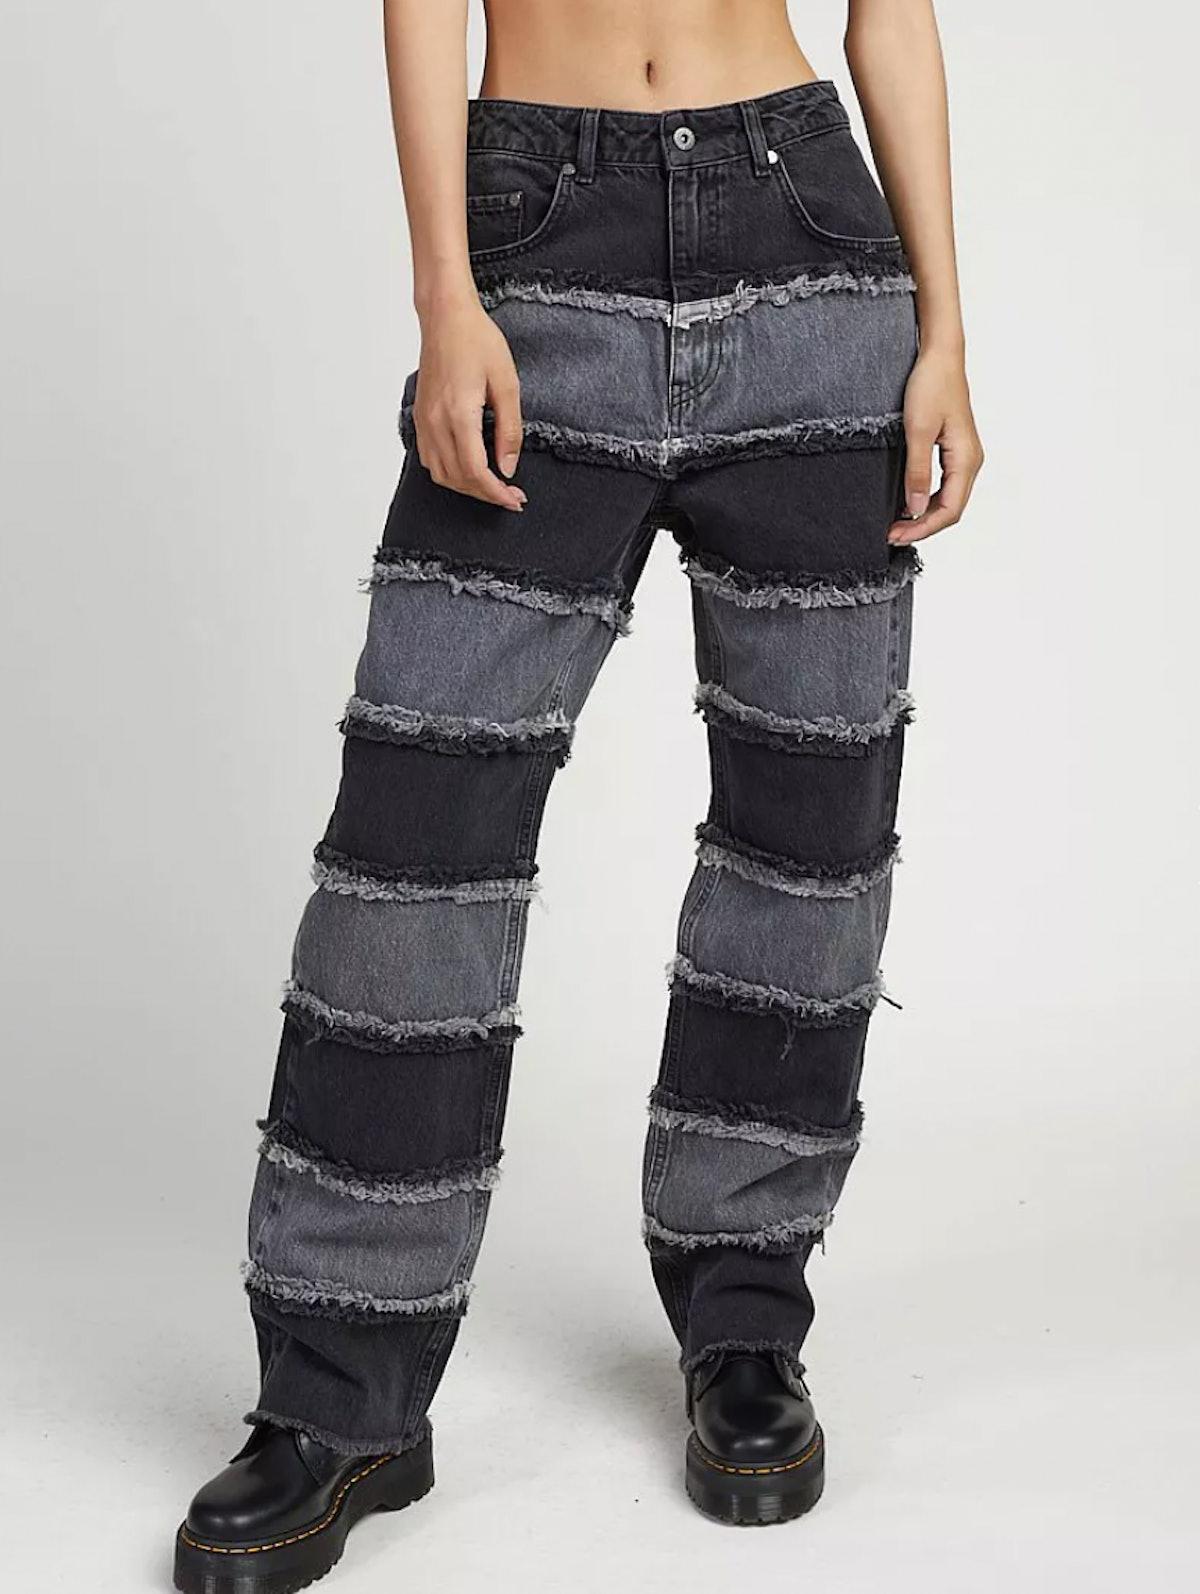 The Ragged Priest High Waist Jeans in Patchwork Stripe Denim